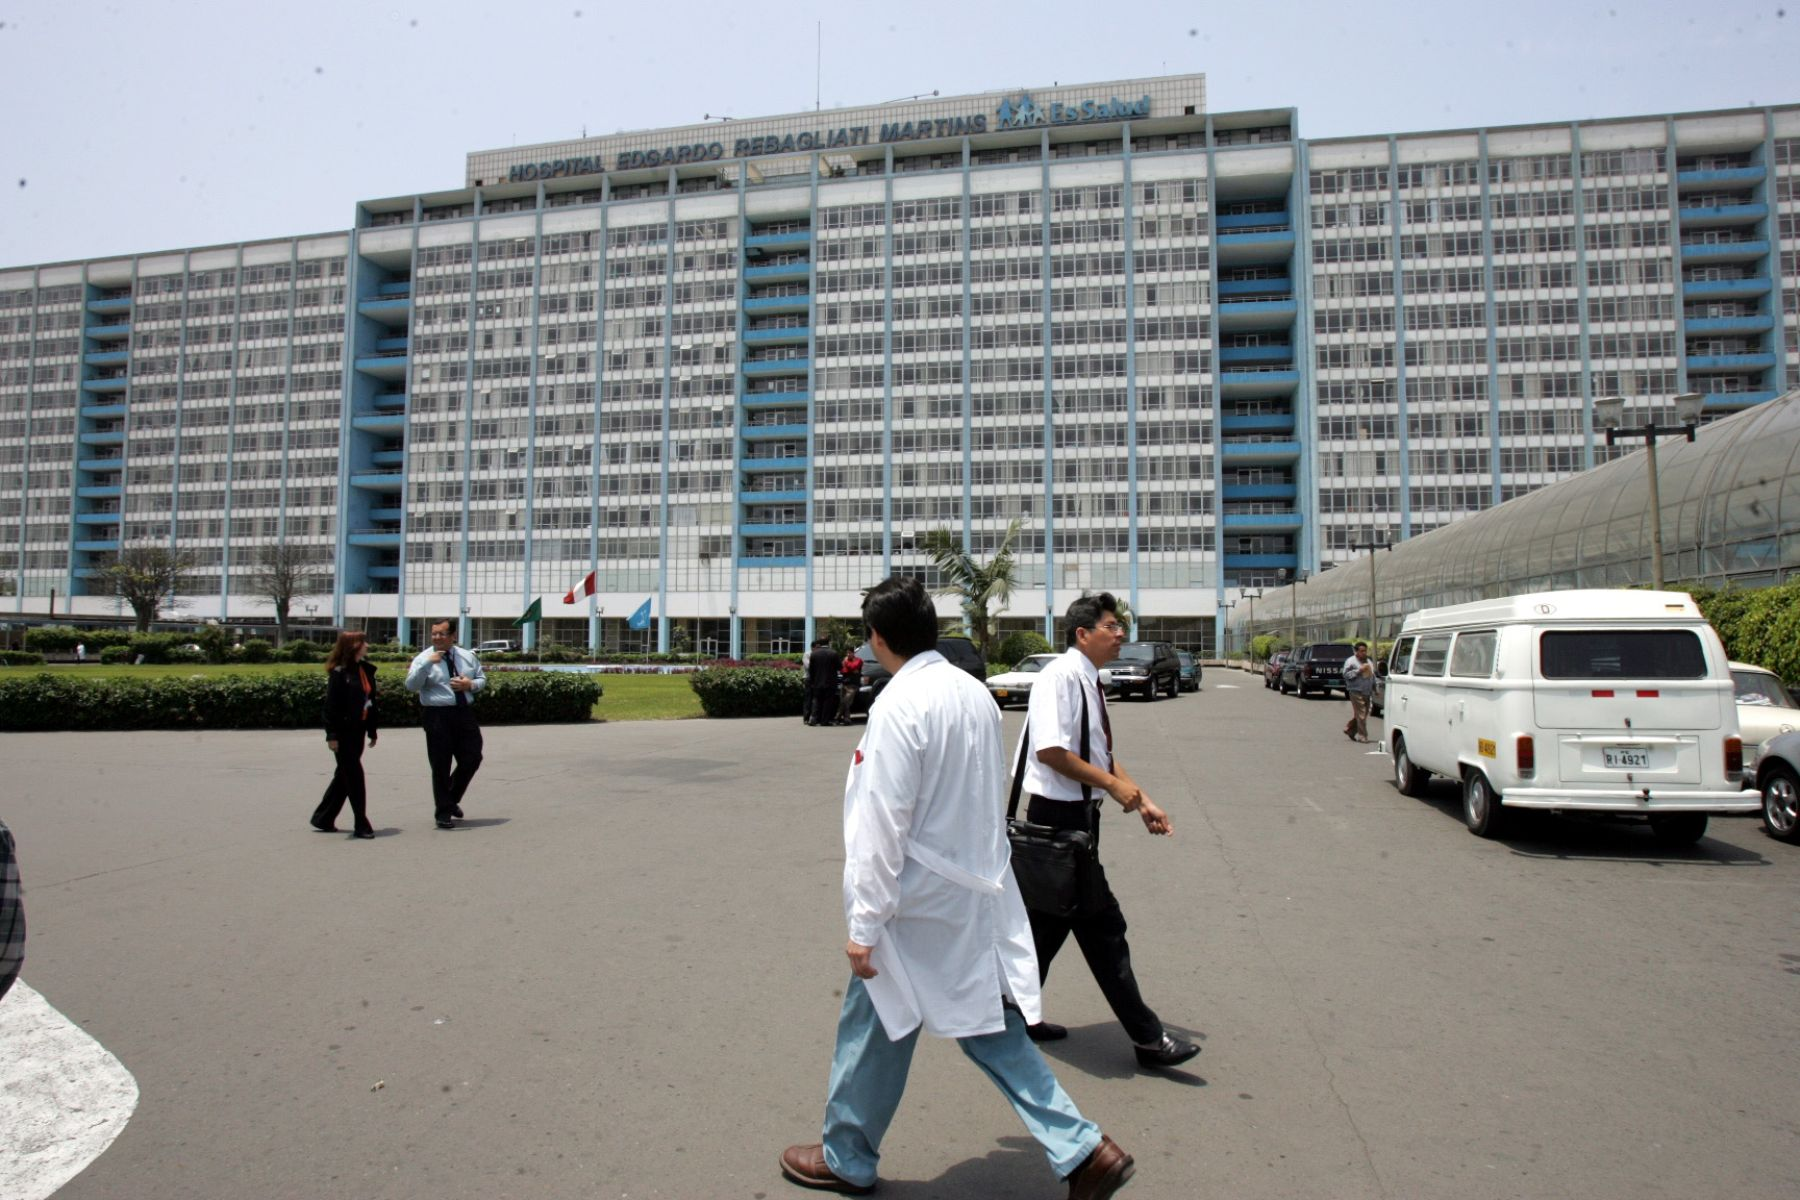 Hospital Edgardo Rebagliati Martins